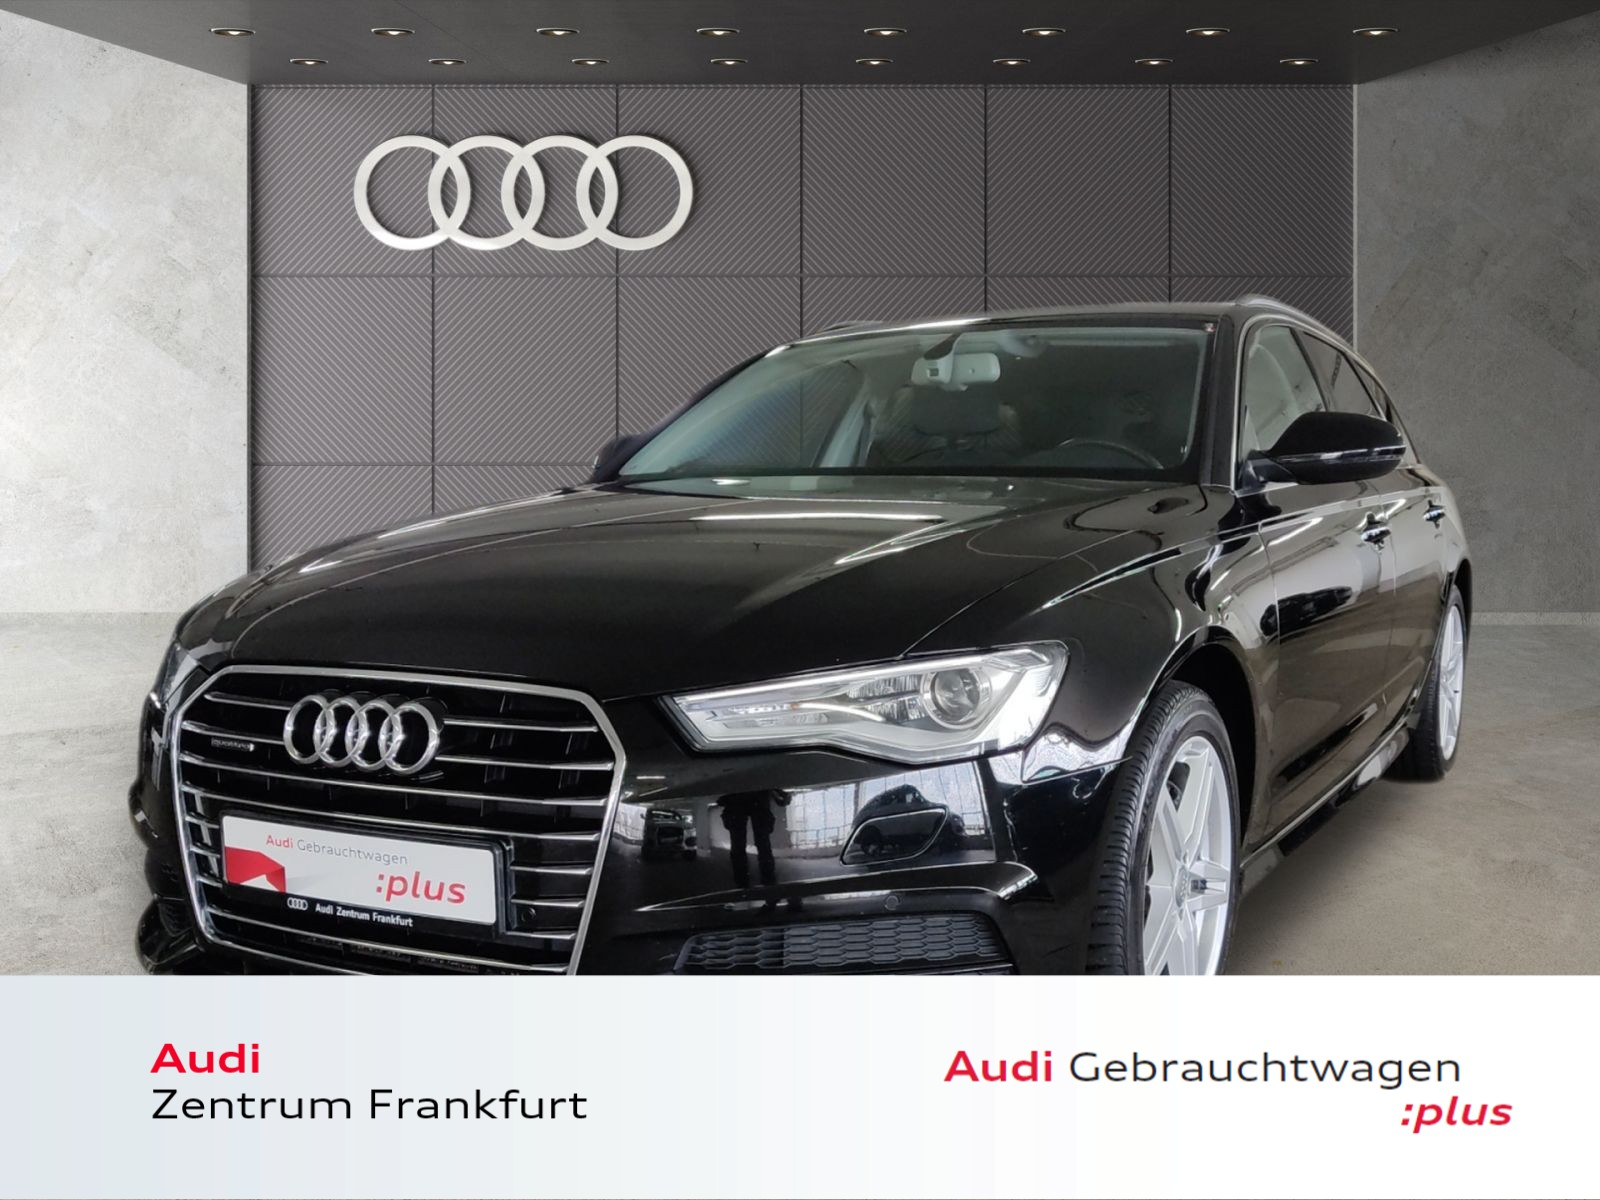 Audi A6 Avant 3.0 TDI quattro S tronic Xenon Navi PDC Tempomat Sitzheizung, Jahr 2018, Diesel